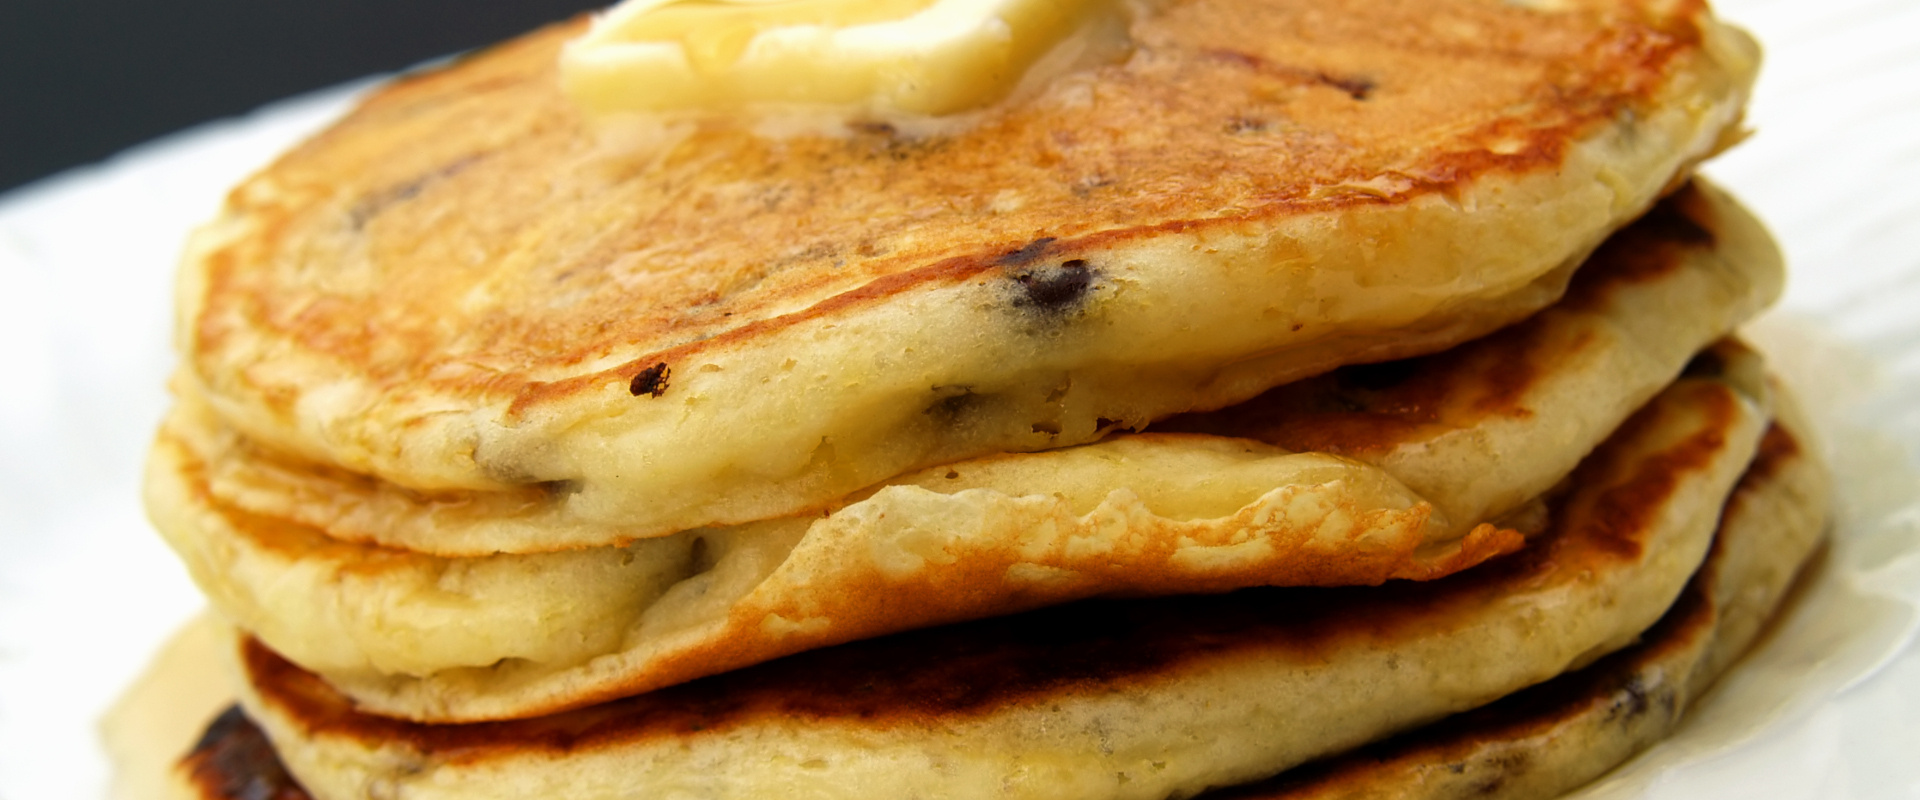 csokichipses pancake